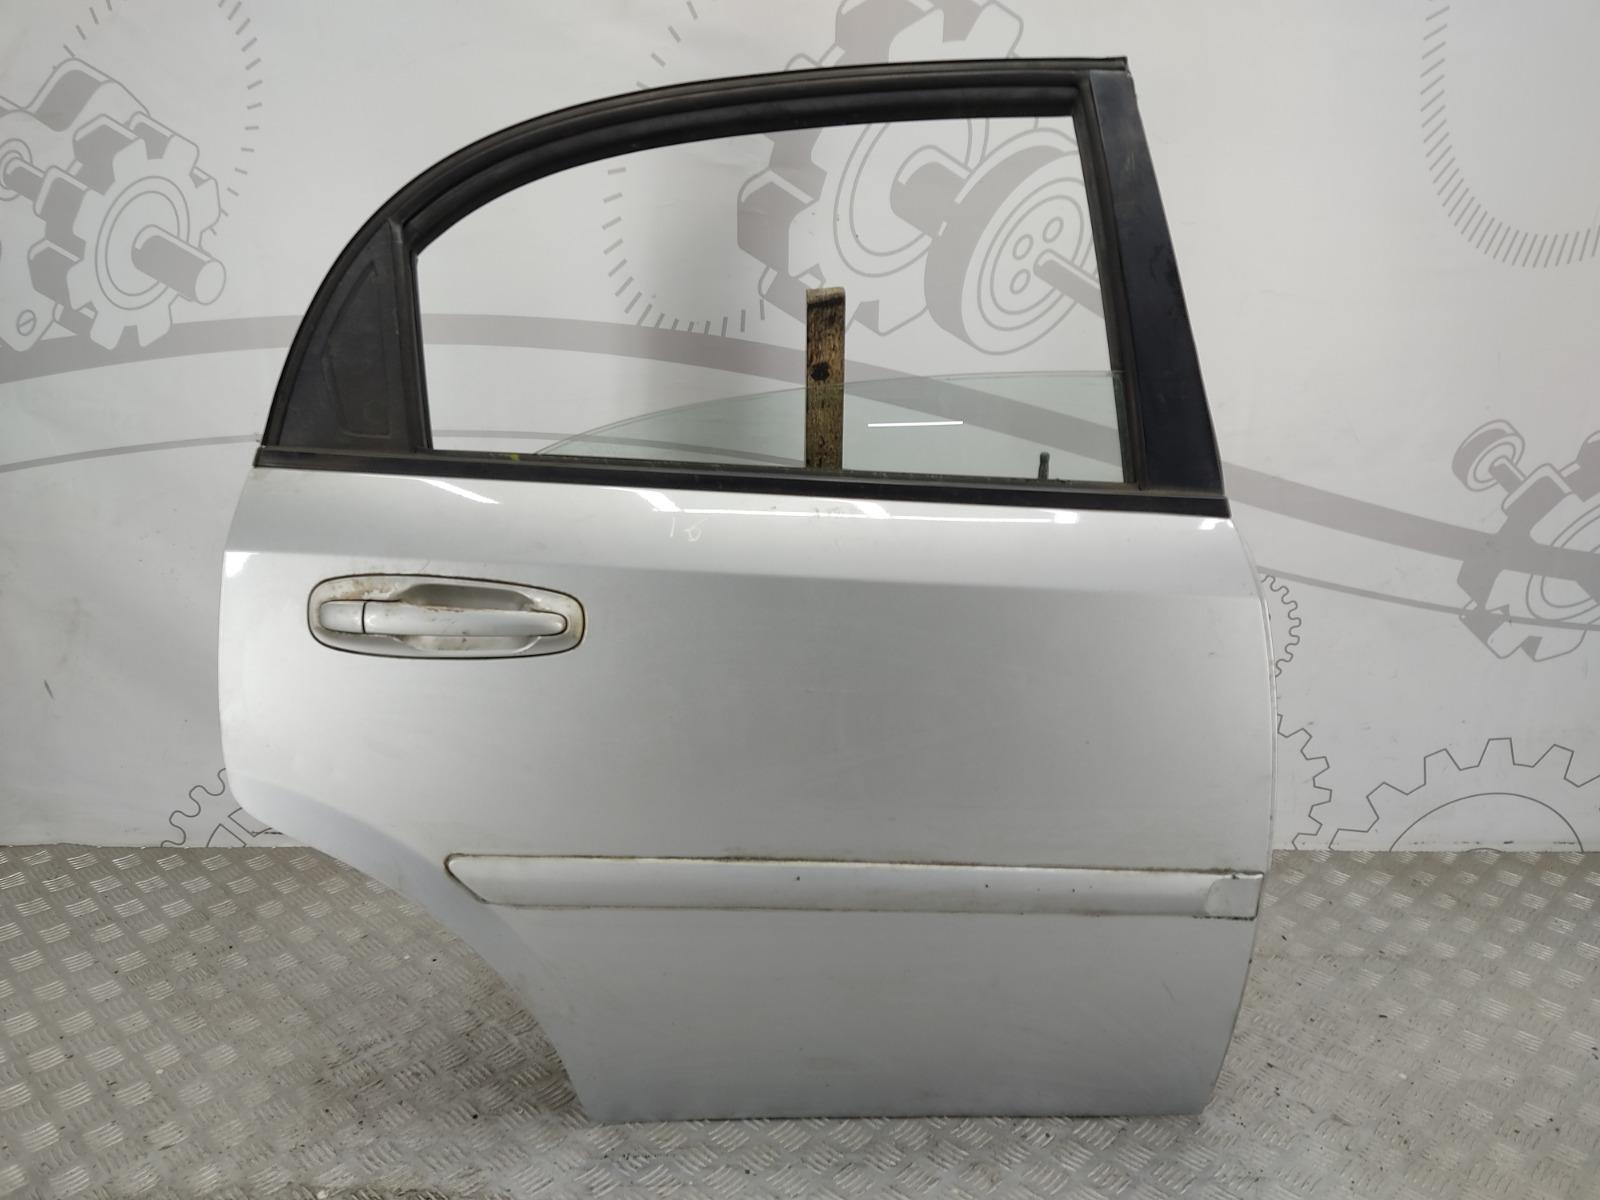 Дверь задняя правая Chevrolet Lacetti 1.6 I 2007 (б/у)